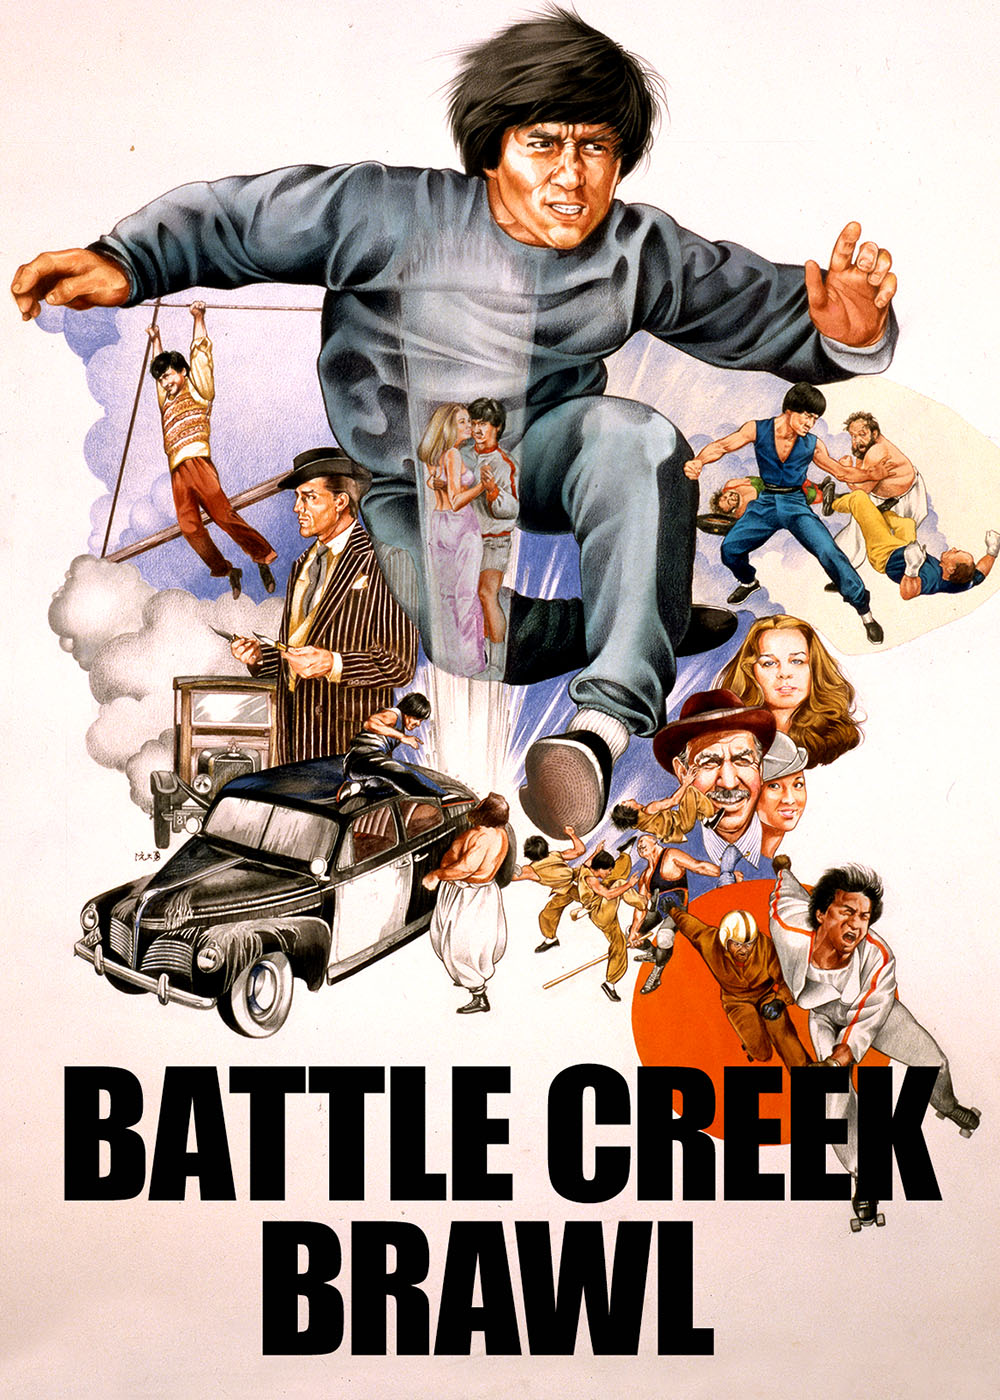 battlecreekbrawl_poster.jpg